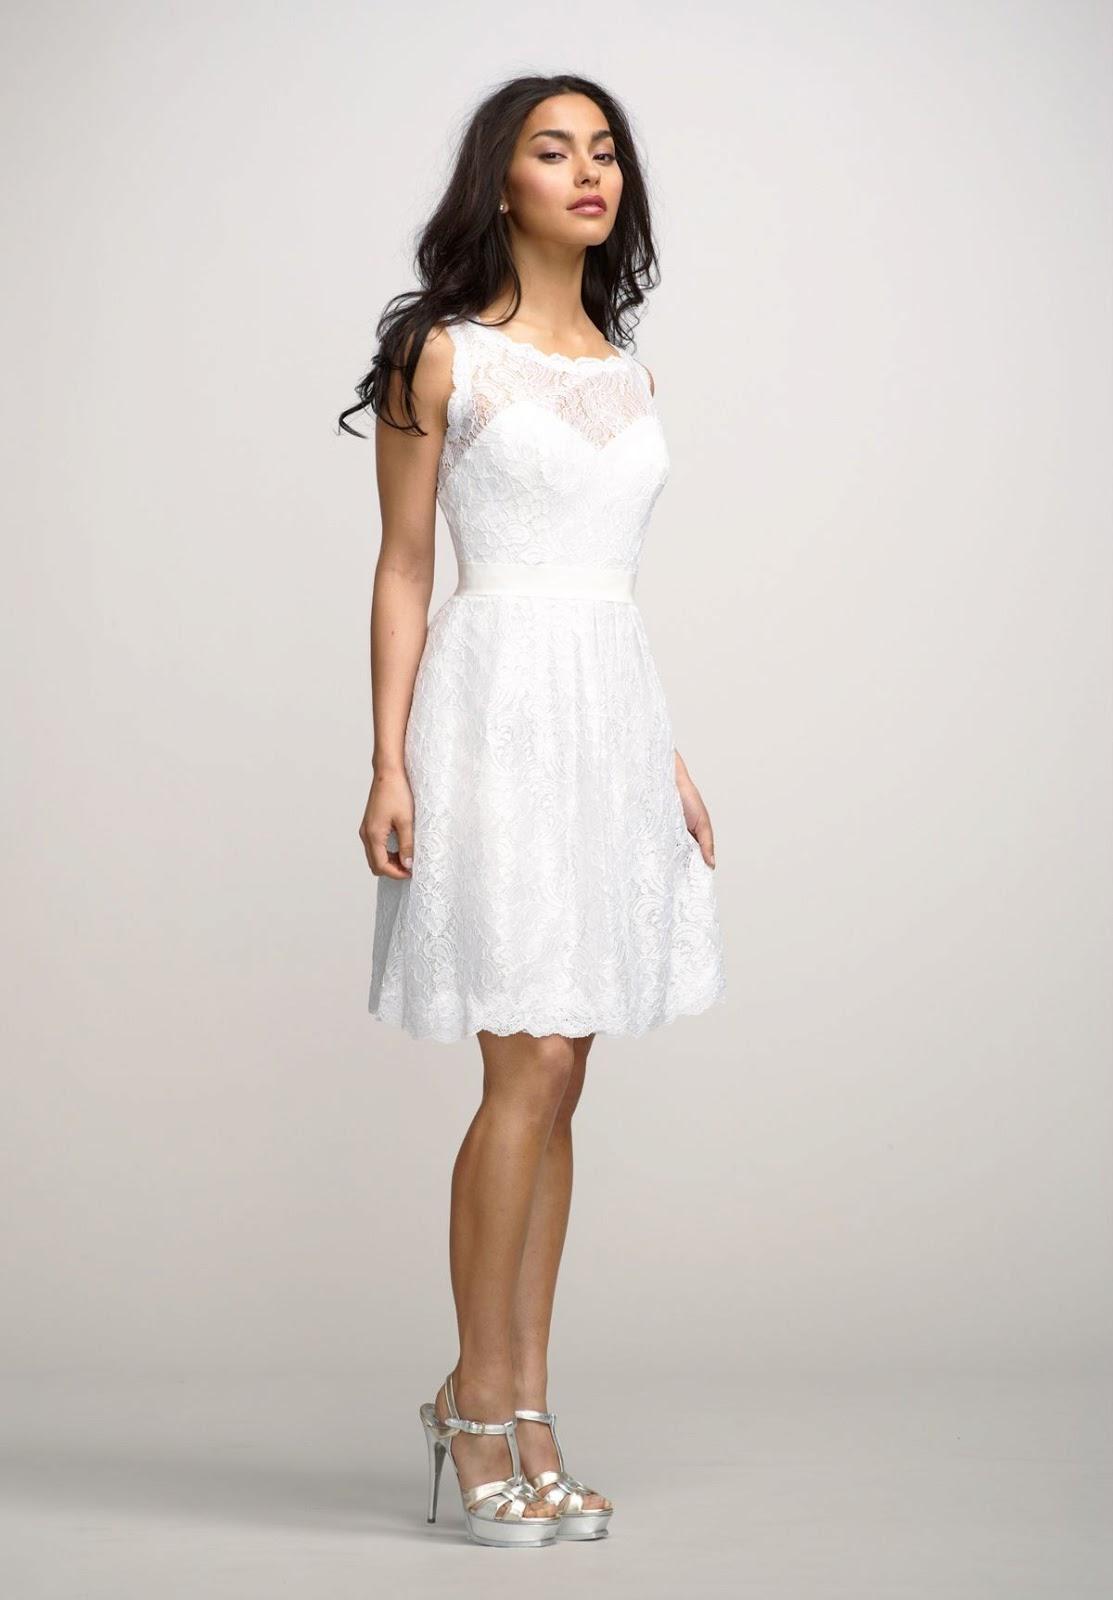 reception wedding dresses photo - 1